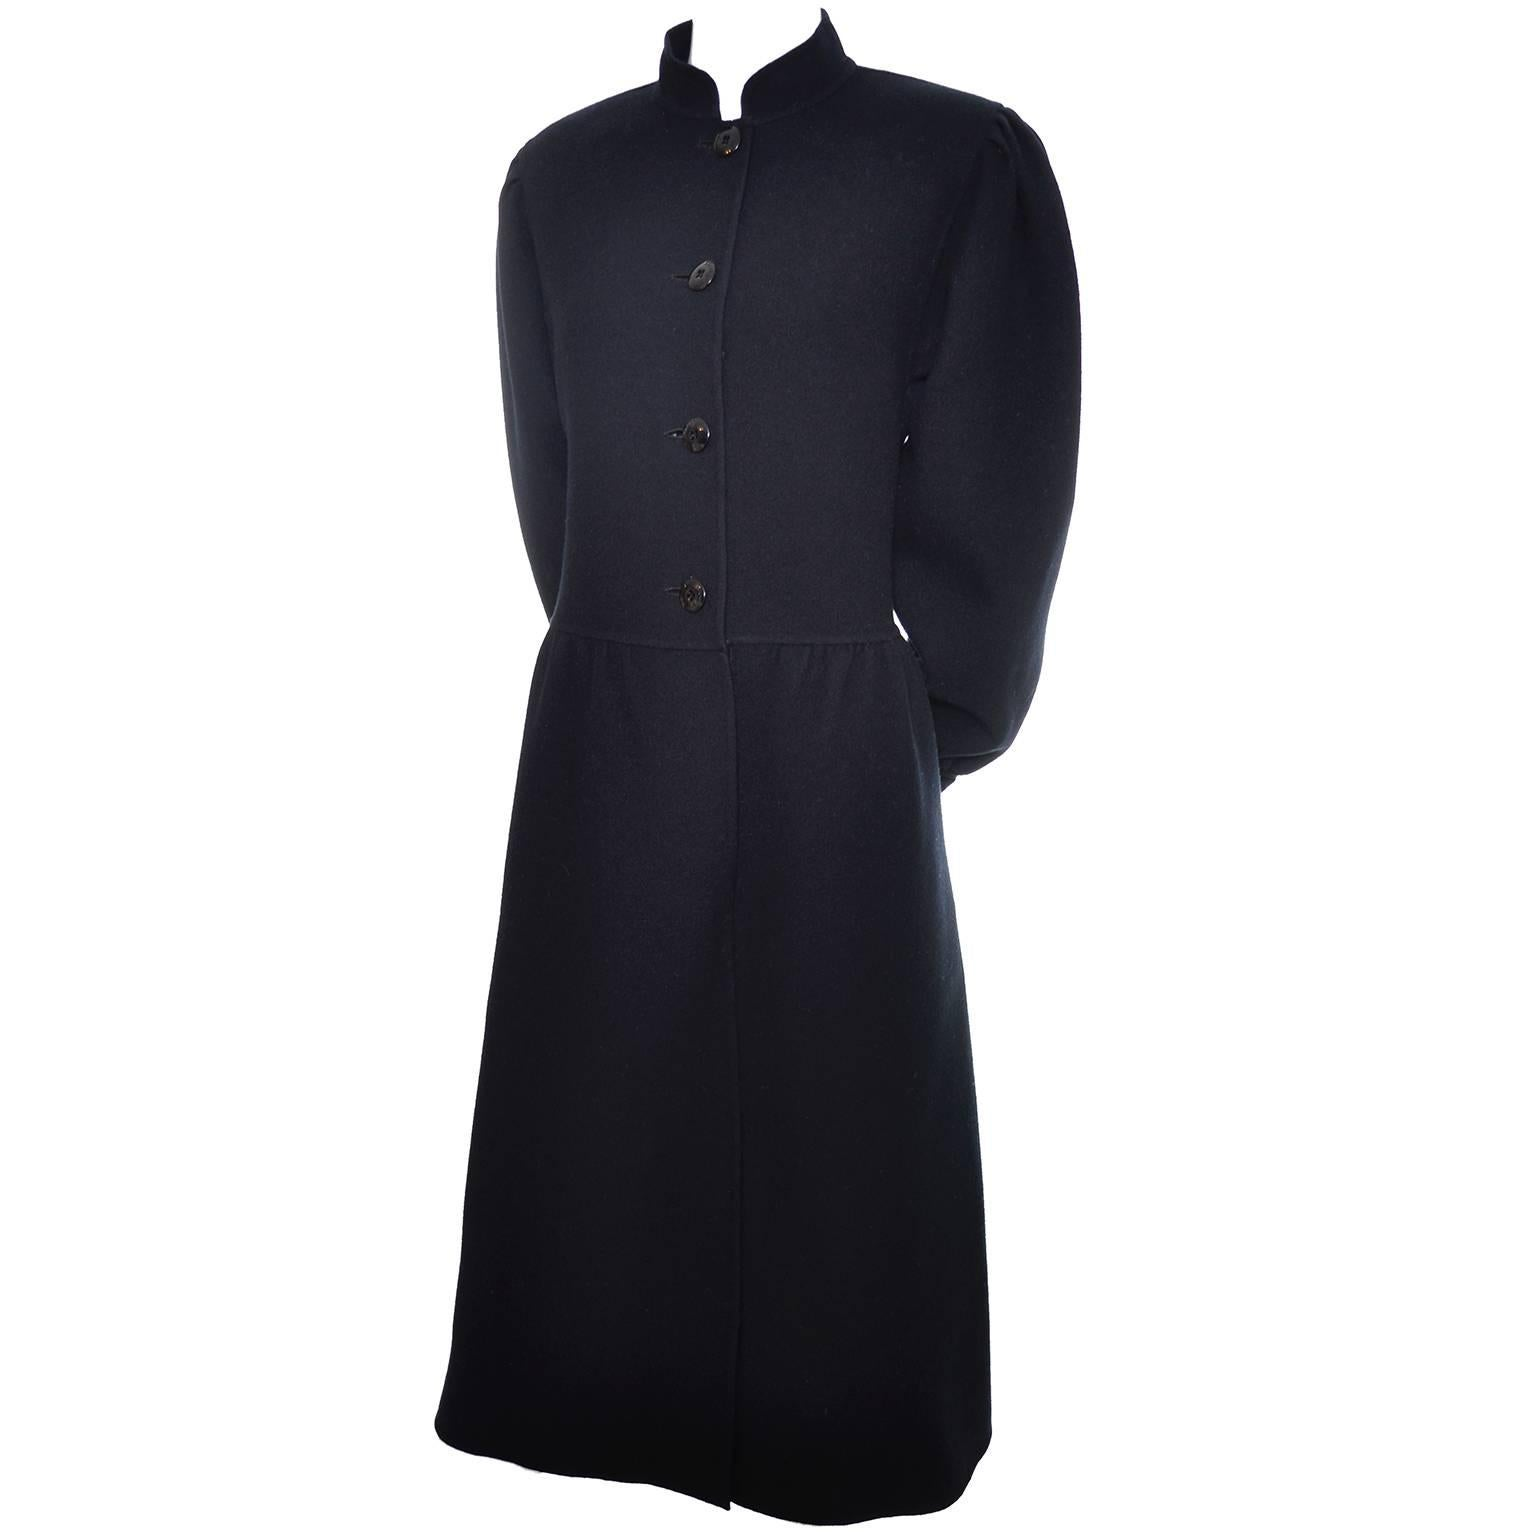 1980s Salvatore Ferragamo Vintage Black Wool Coat or Coat Dress Italy 10